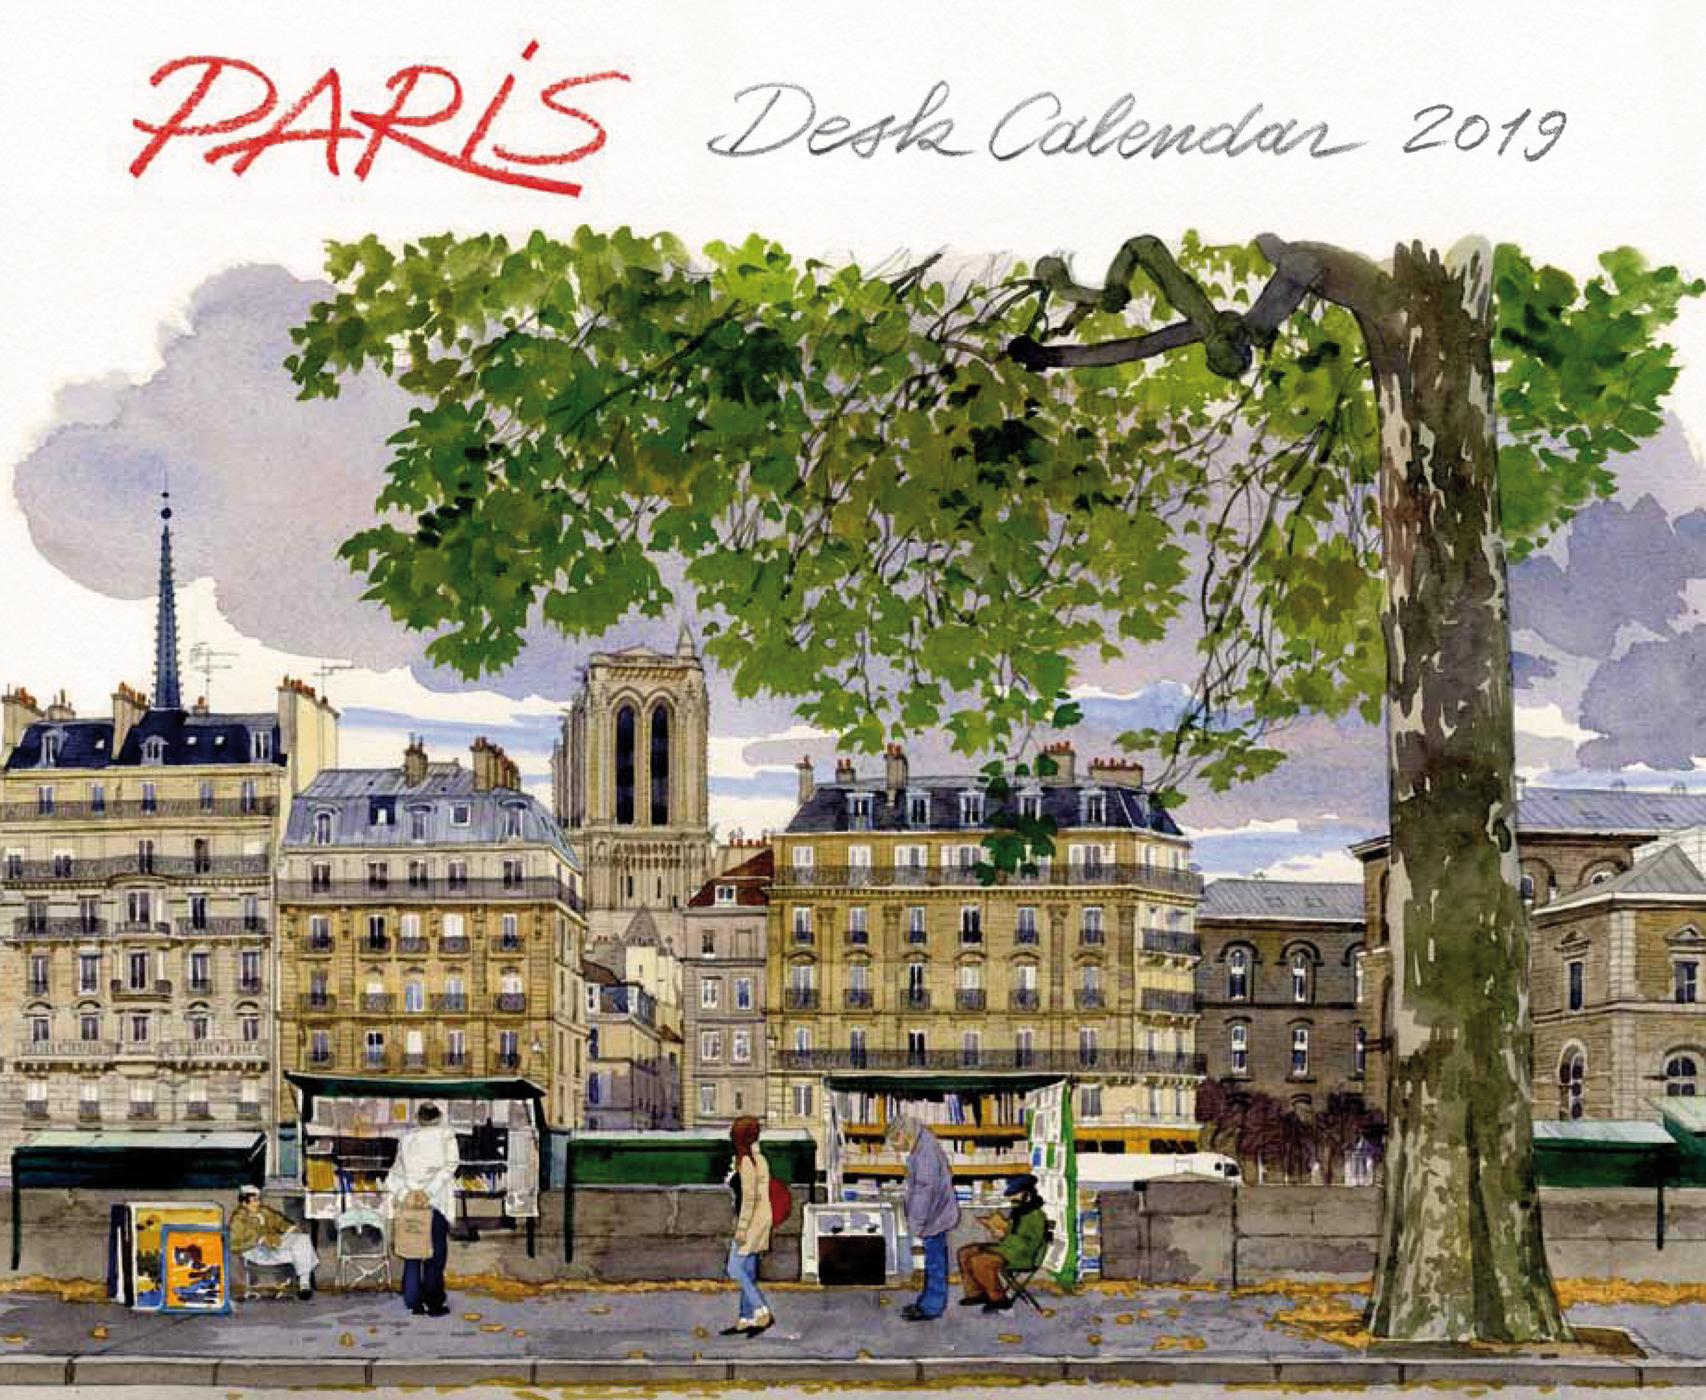 Paris Desk Calendar 2019